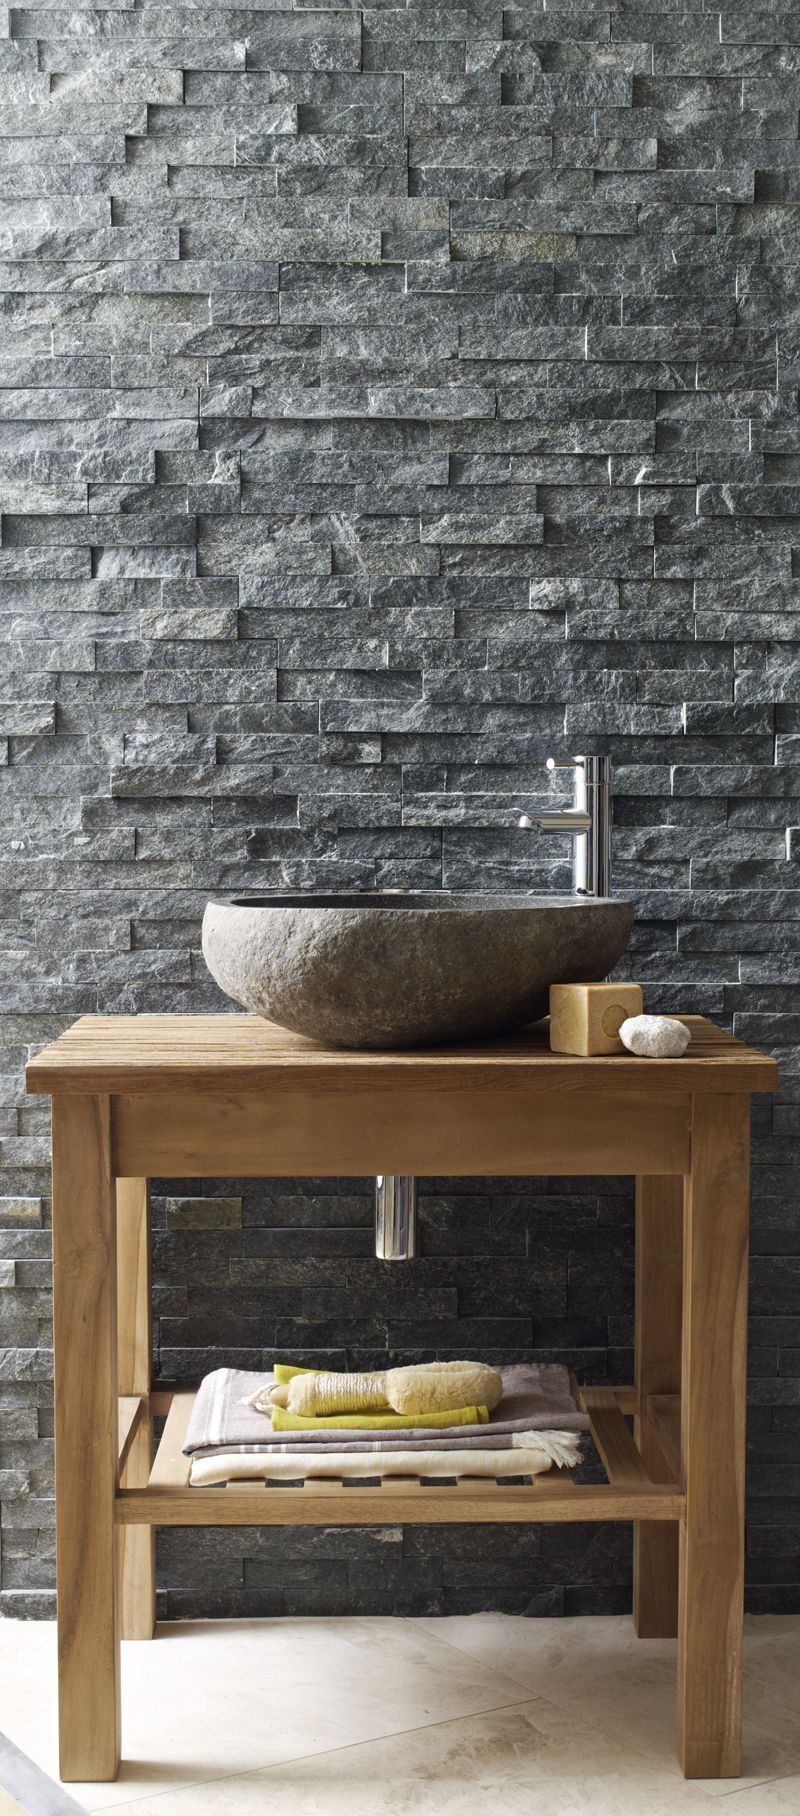 Aspect 6 x 24 inch autumn sandstone peel and stick stone backsplash - Black Quartzite Maxi Splitface Tiles Split Face Wall Tiles Mandarin Stone Tiles Flooring